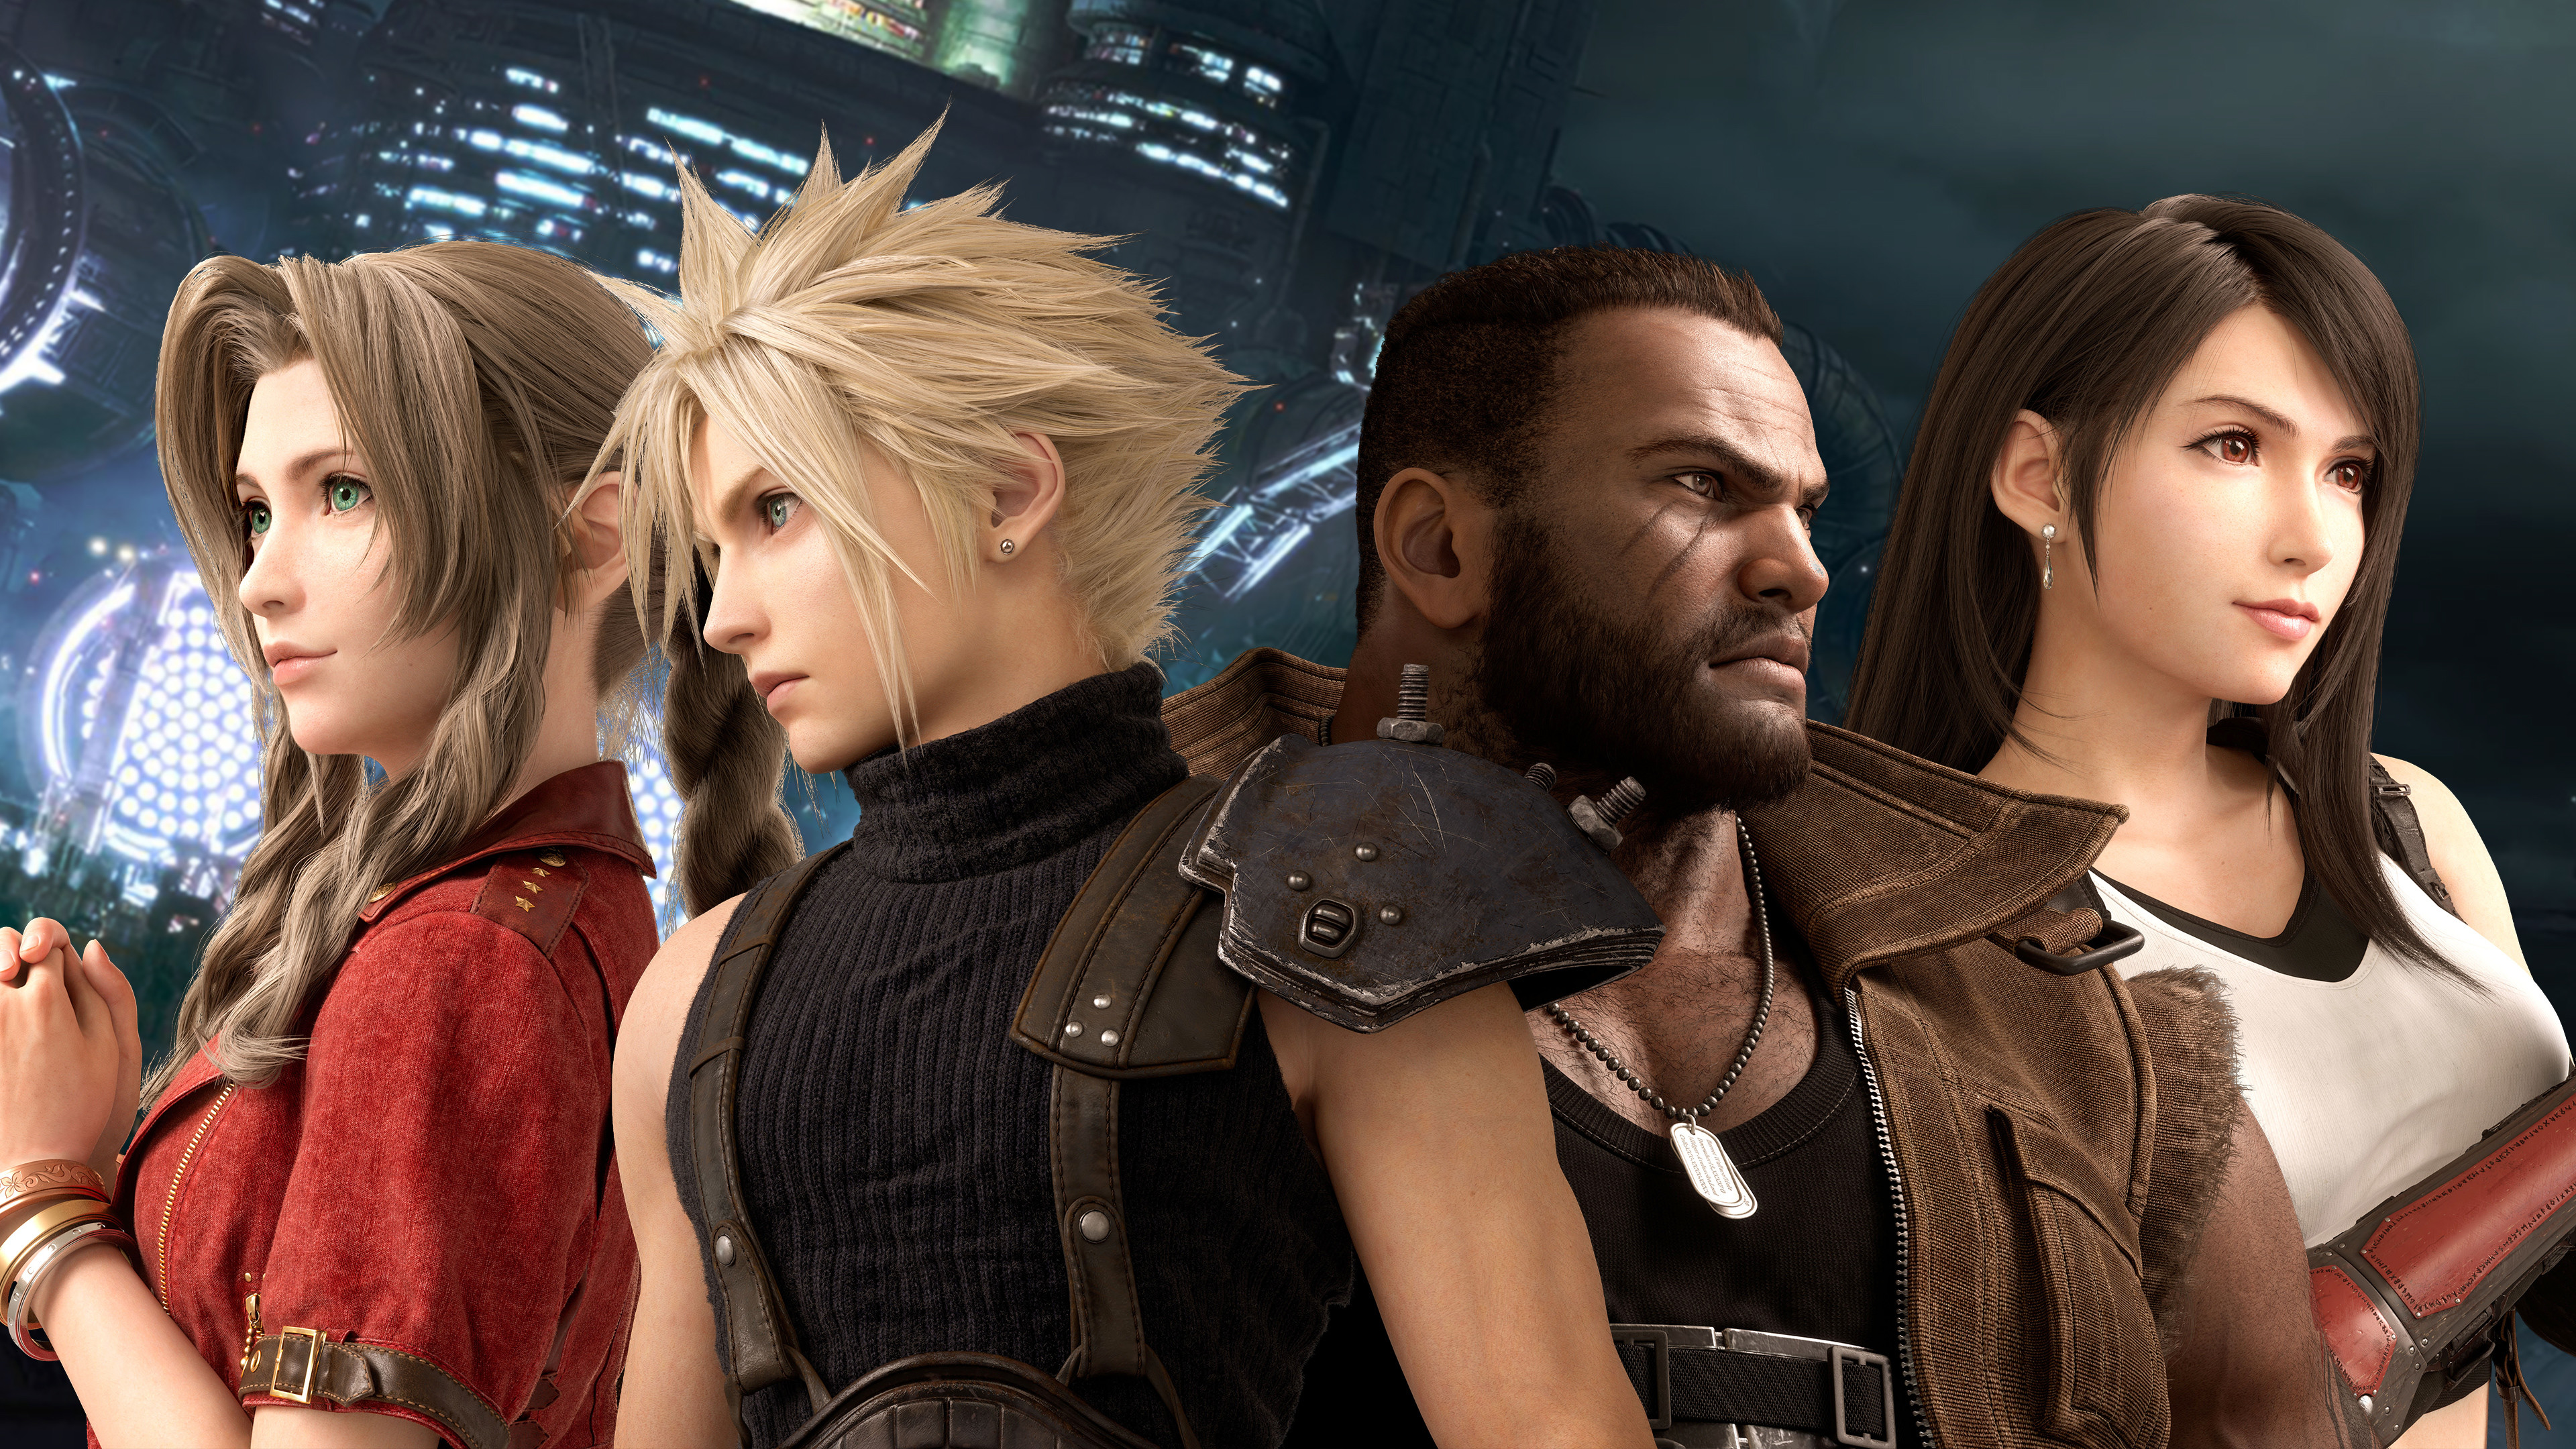 Final Fantasy 7 Remake, Characters, 4K, #39 Wallpaper